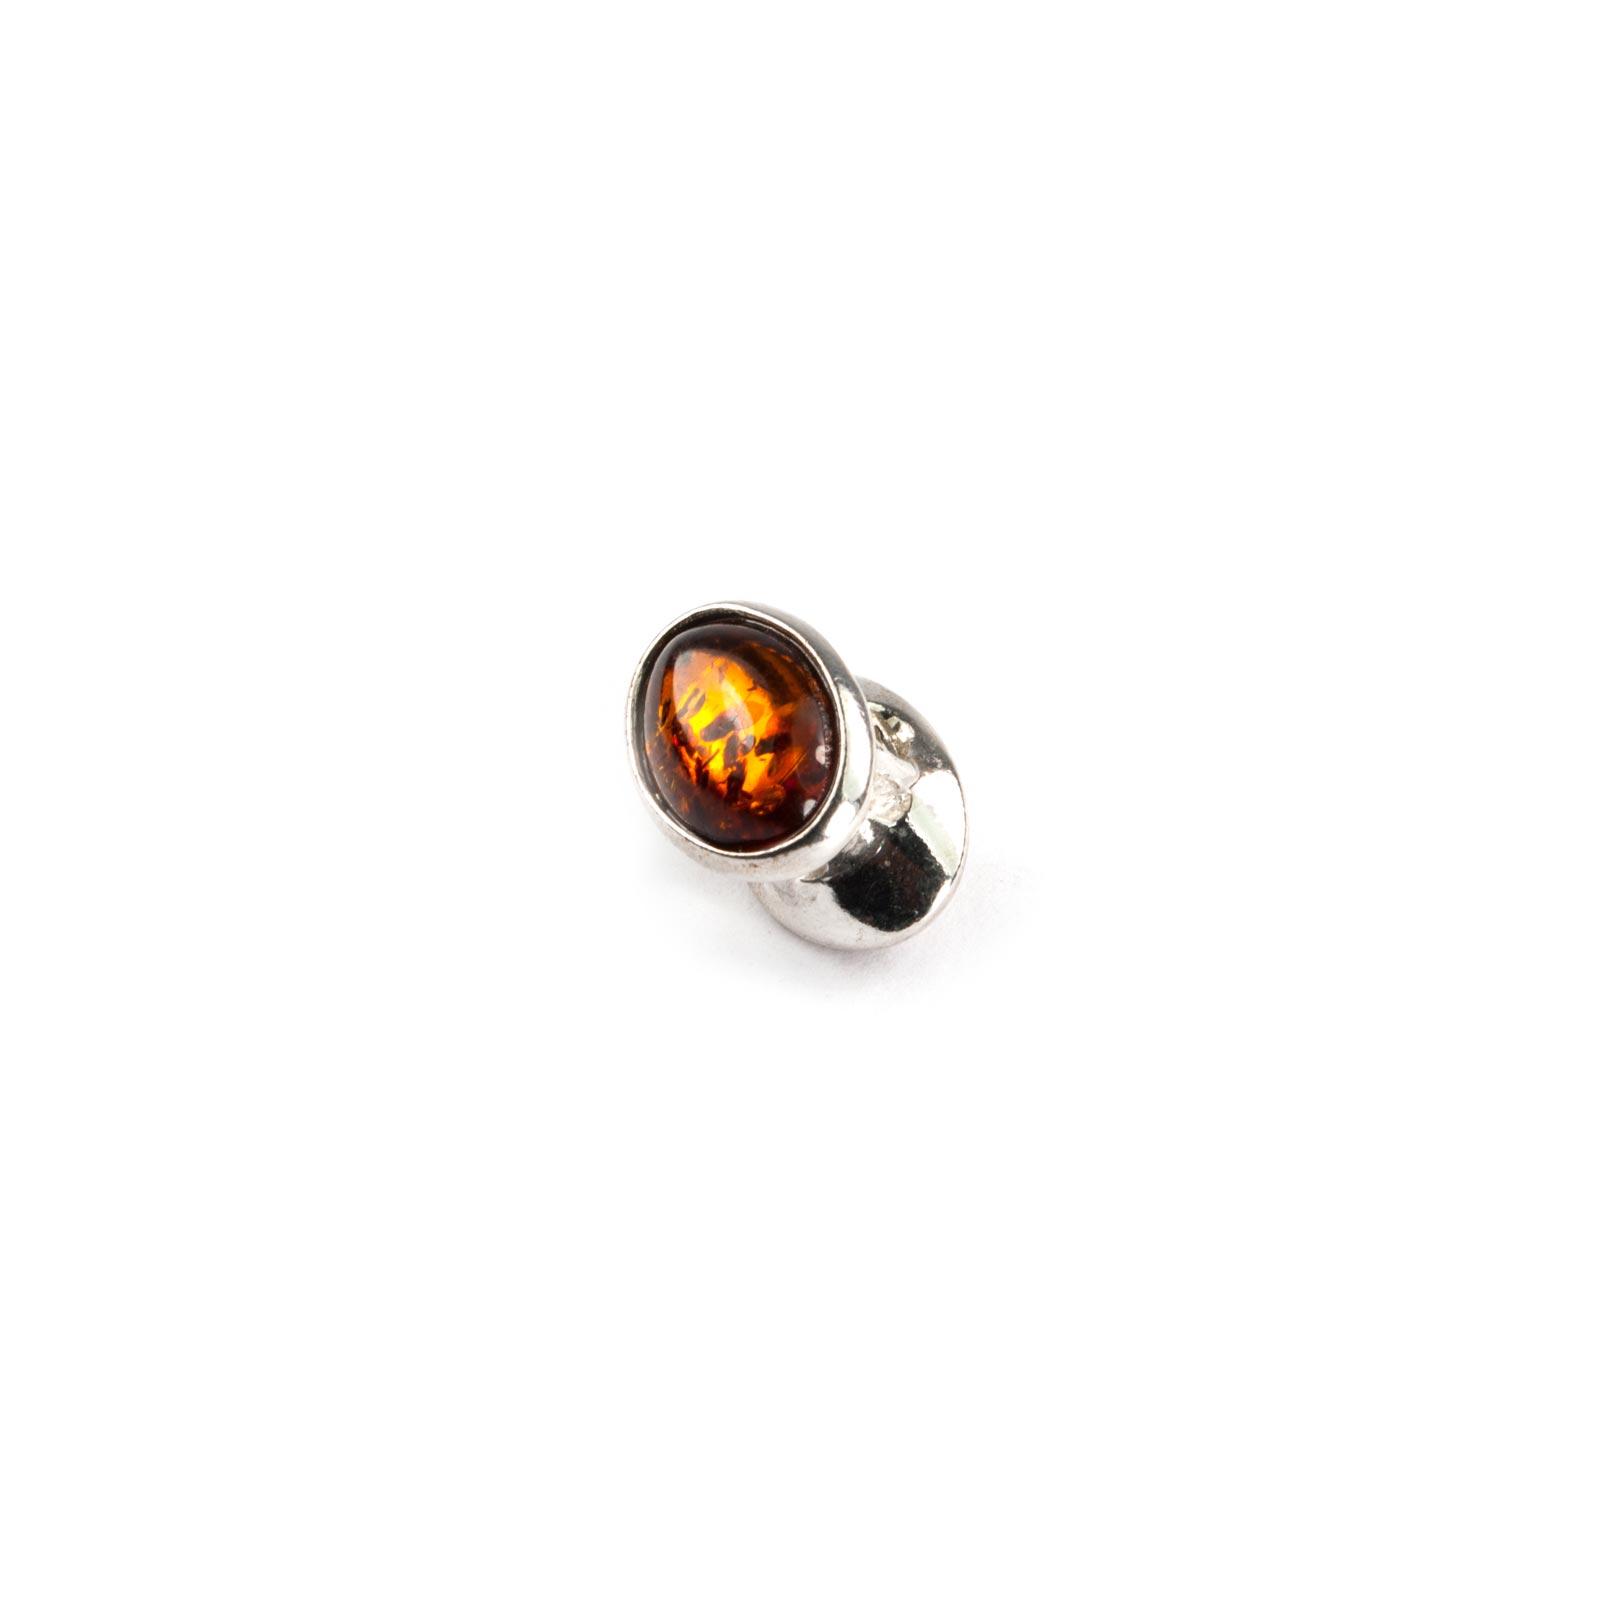 Pandora Style Bead with Cognac Amber